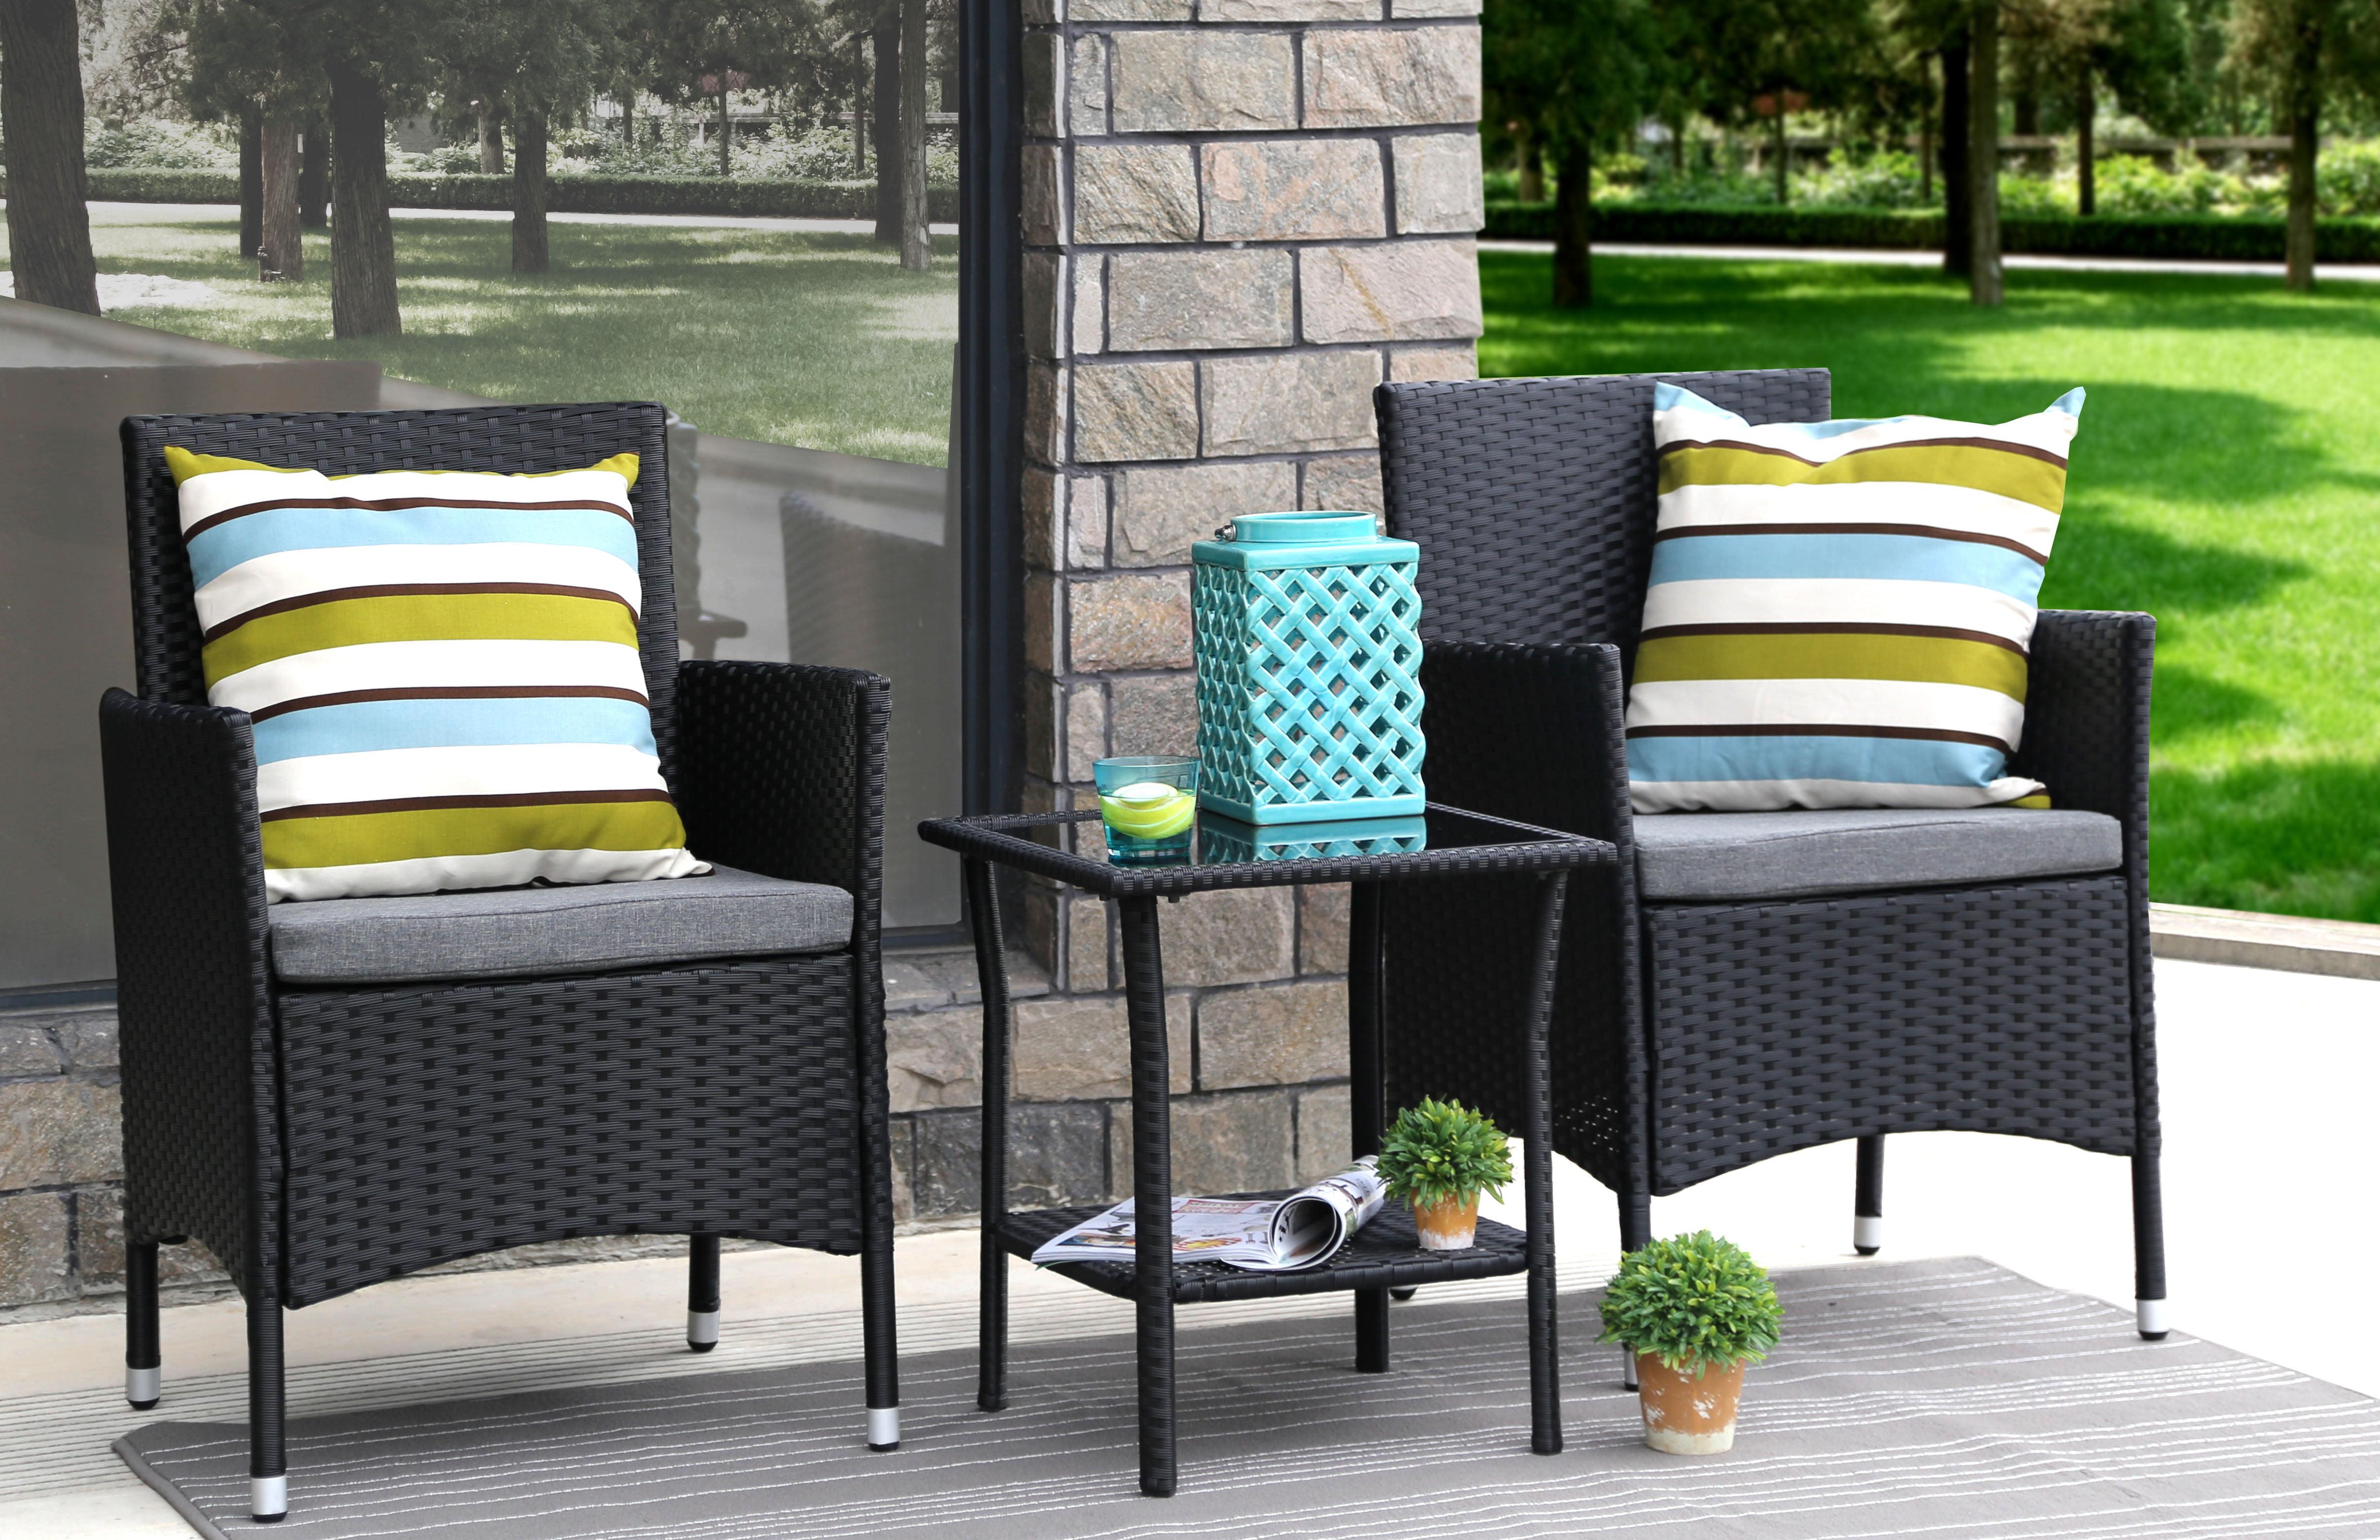 Baner Garden Outdoor Furniture Complete Patio Cushion PE Wicker Rattan Garden Dining Room Set, Black, 3-Pieces by Overstock